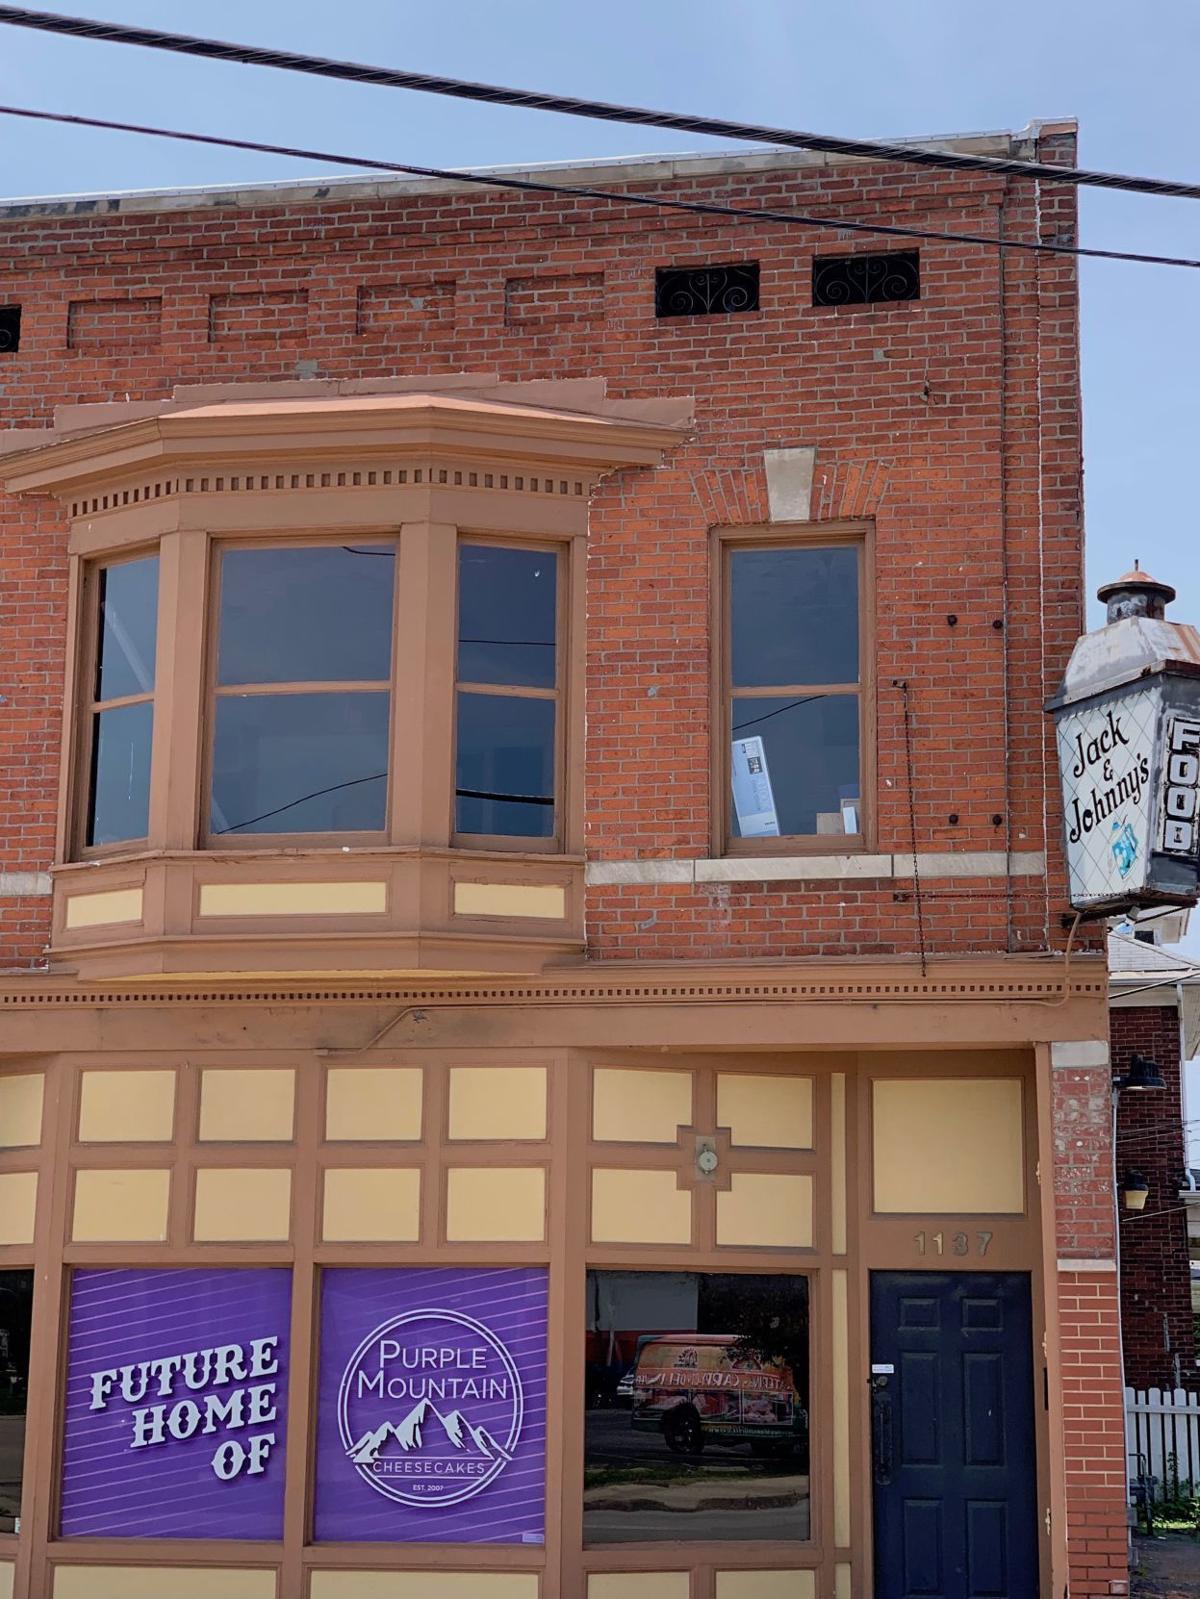 Purple Mountain Cheesecakes building